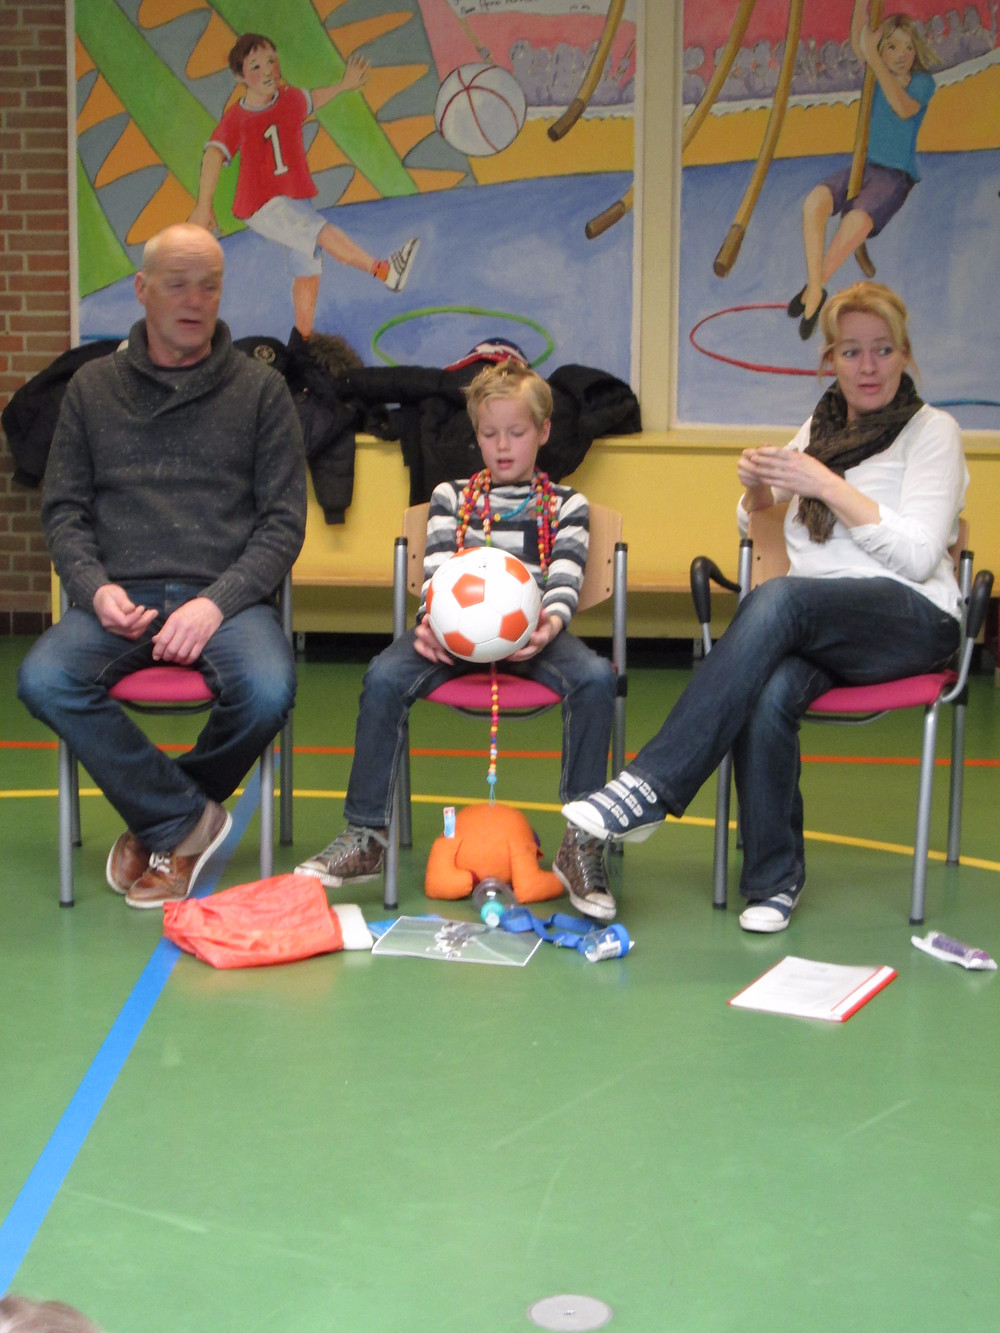 Stichting Ramon scoort tegen kanker - Cbs it Harspit, Oppenhuizen 1_edited.jpg